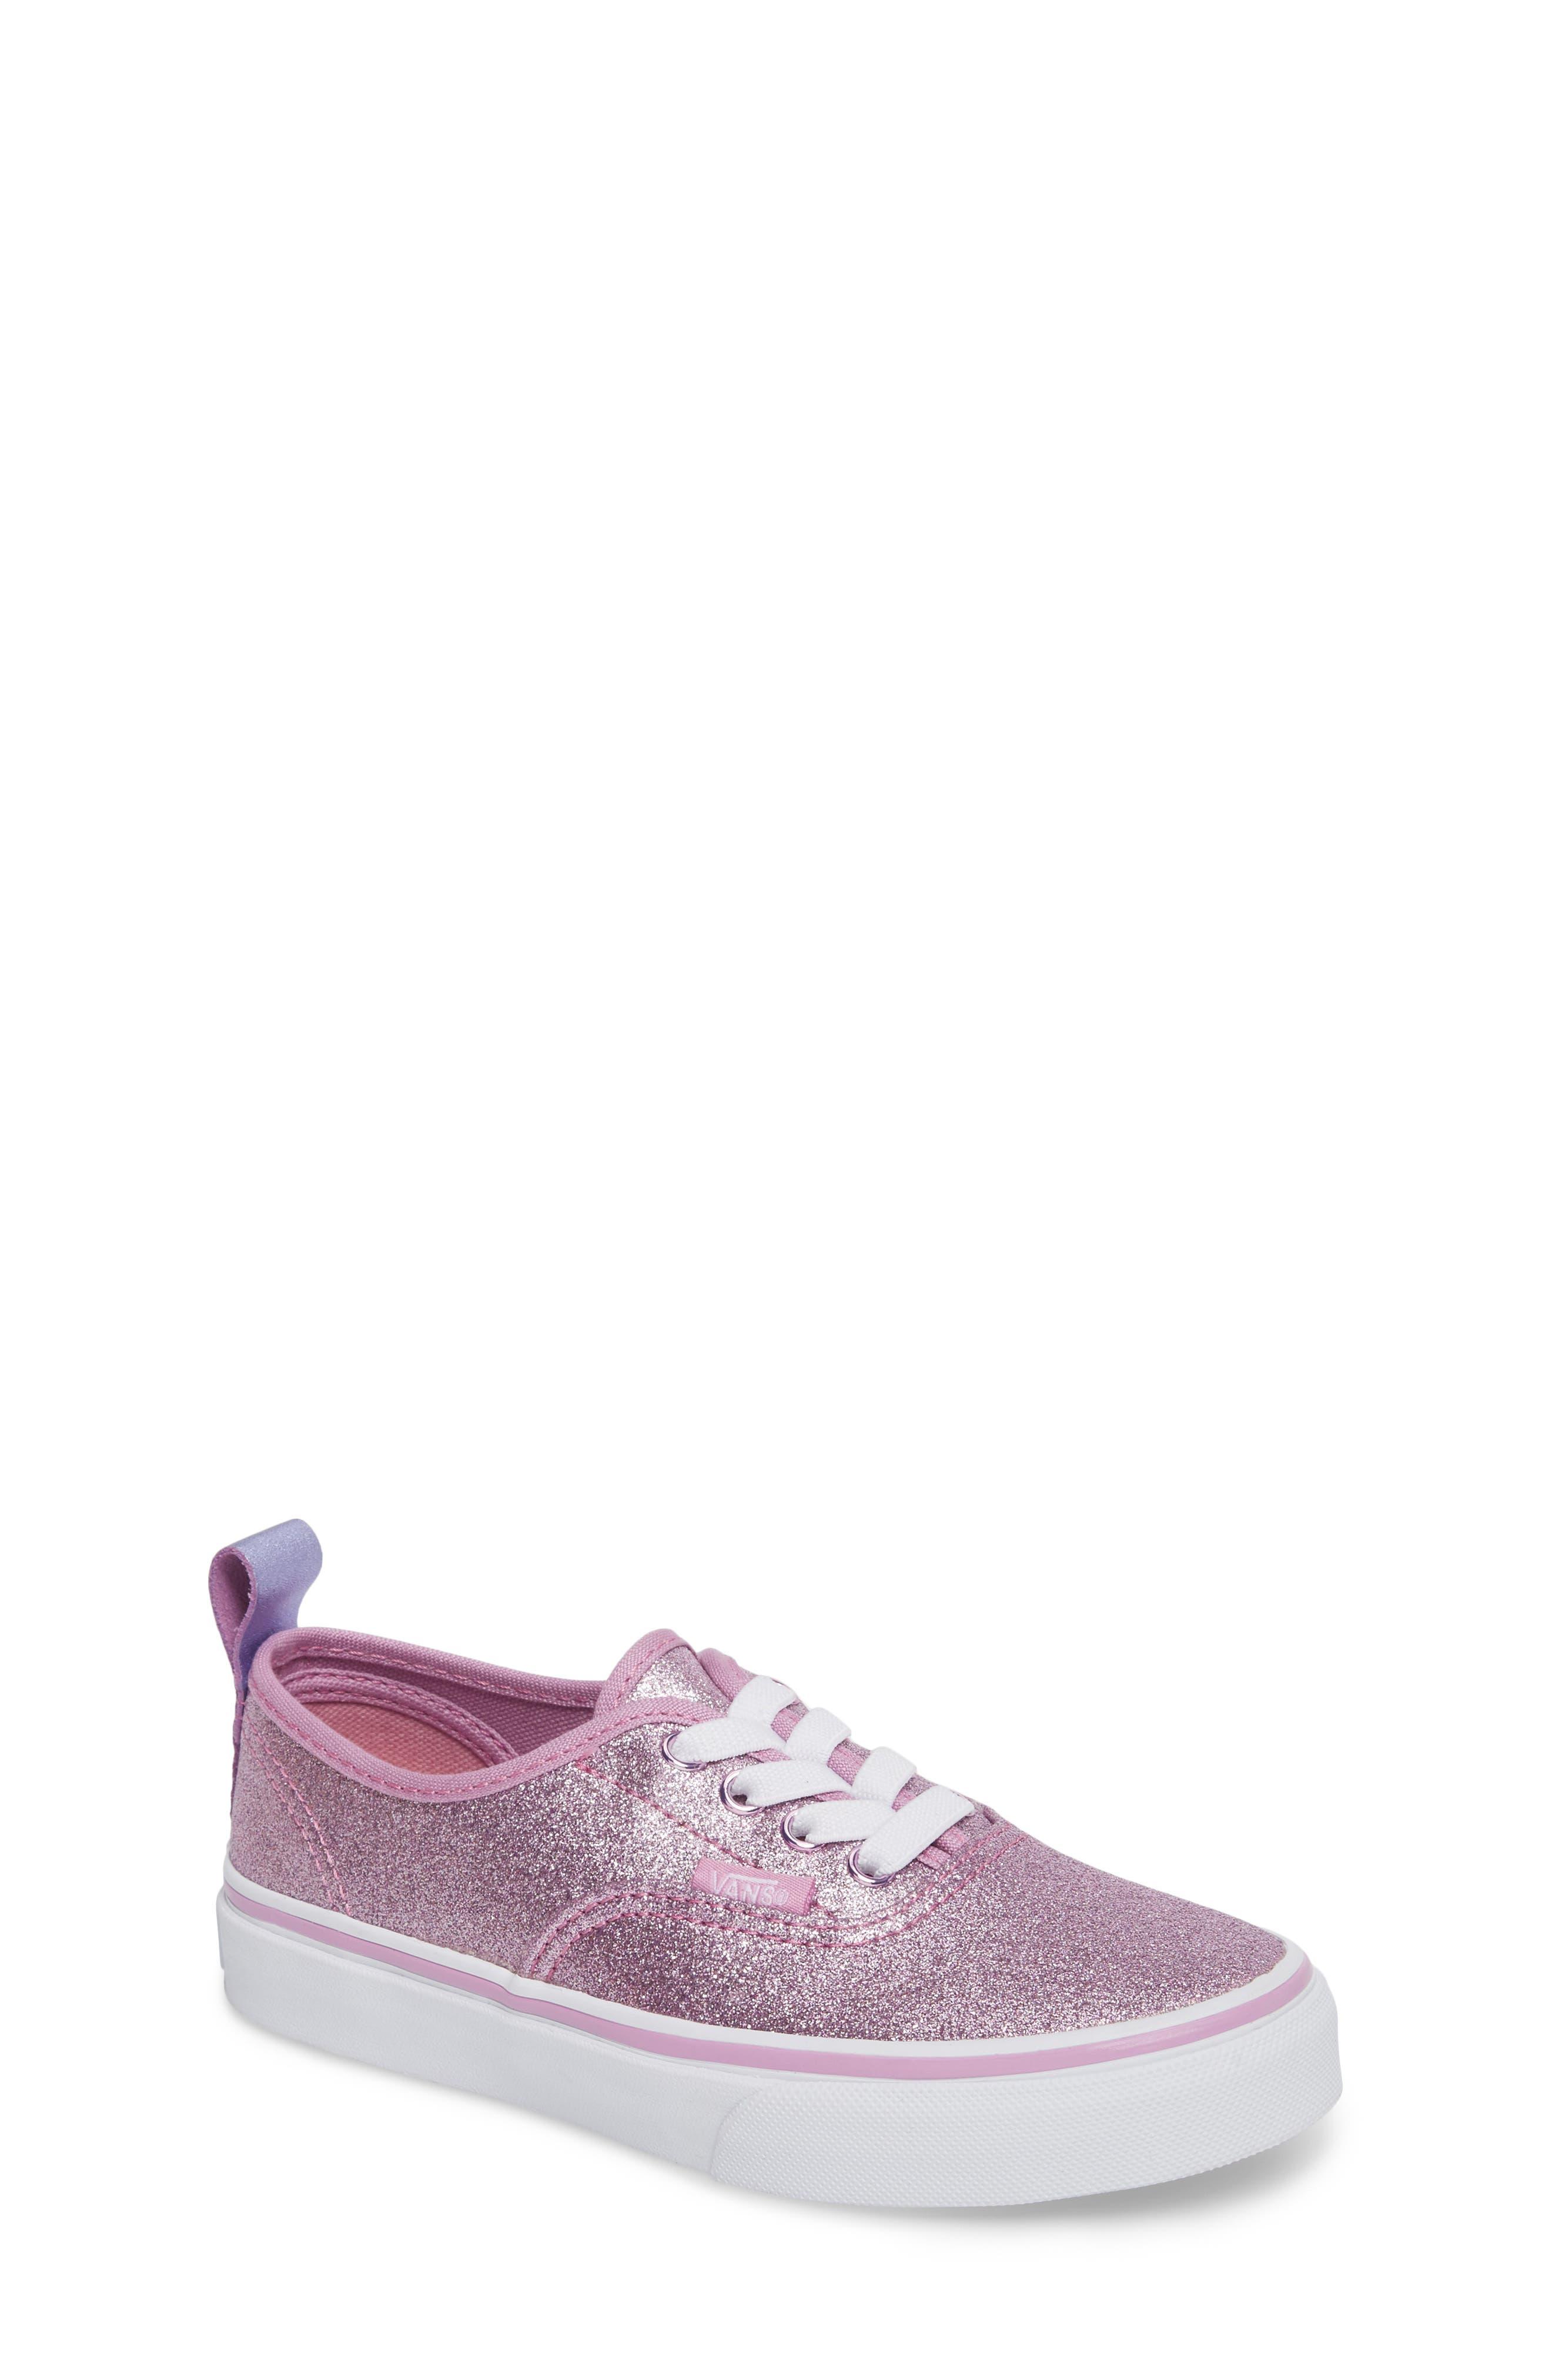 Vans Glitter Authentic Elastic Lace Sneaker (Baby, Walker, Toddler, Little Kid & Big Kid)